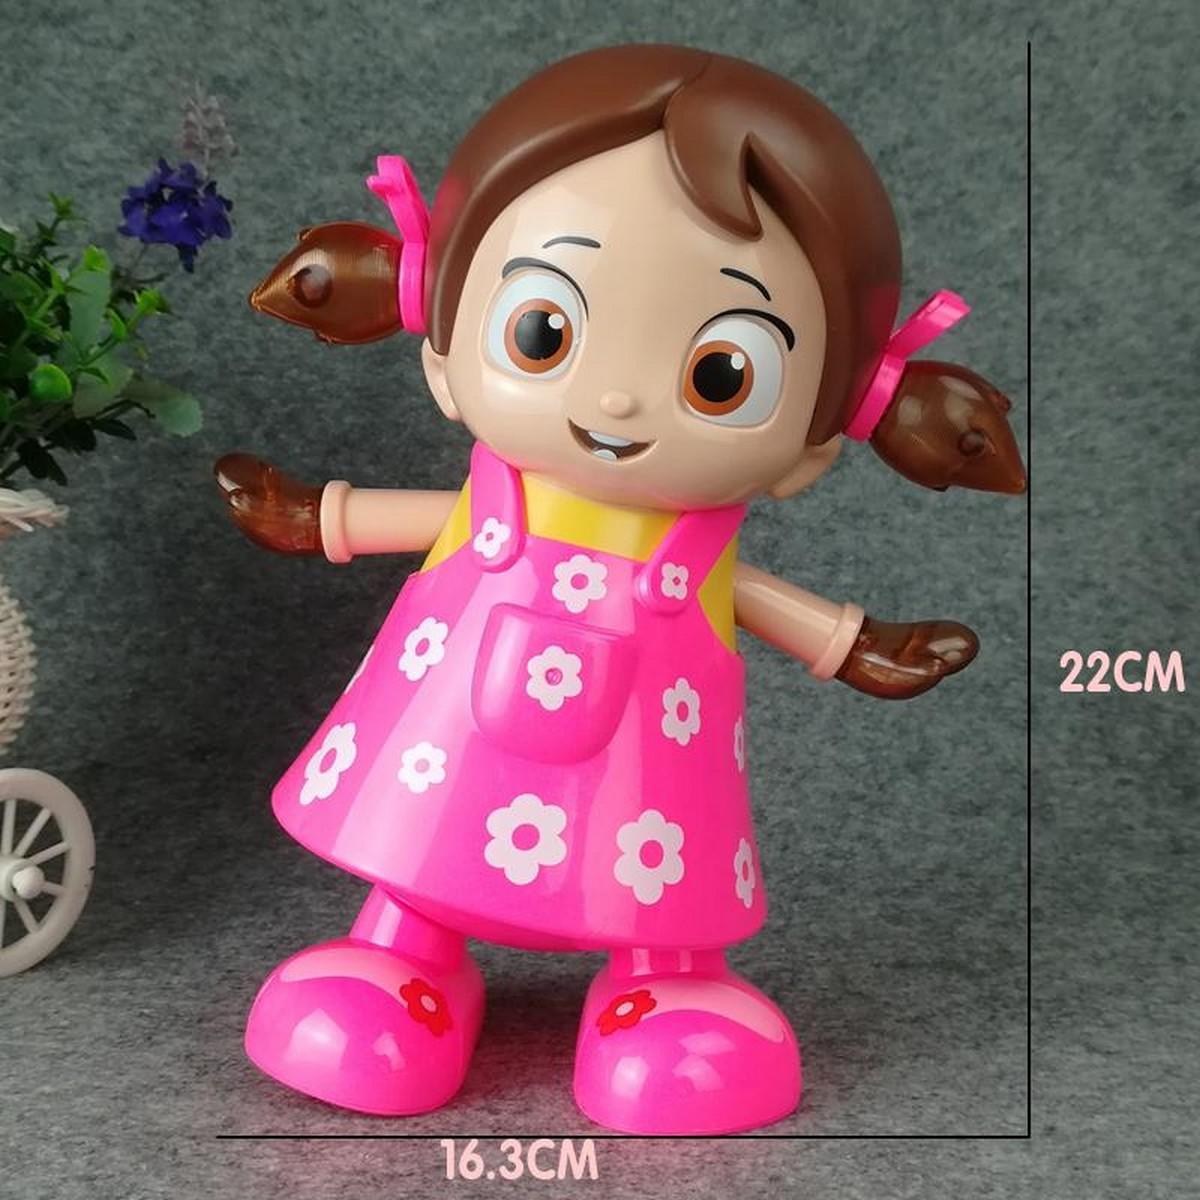 Kids Toys for Baby Walking Singing Dancing Dolls Toys for Girls Baby rebon Dolls Children Toys Dolls Toy Girl Gift